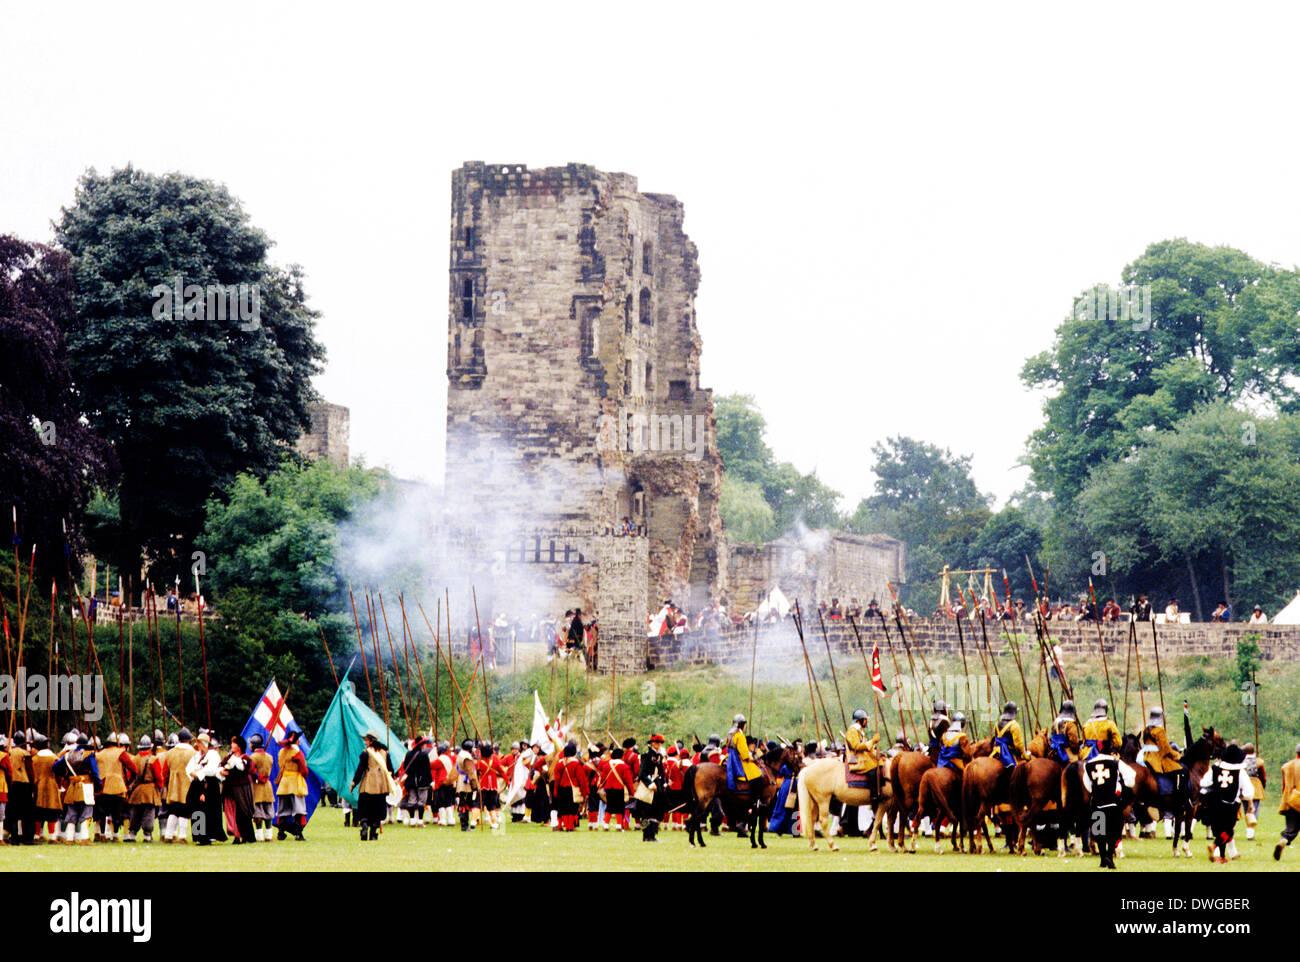 Ashby de la Zouch, English Civil War siege, 1640 historical re-enactment, Leicestershire England UK - Stock Image